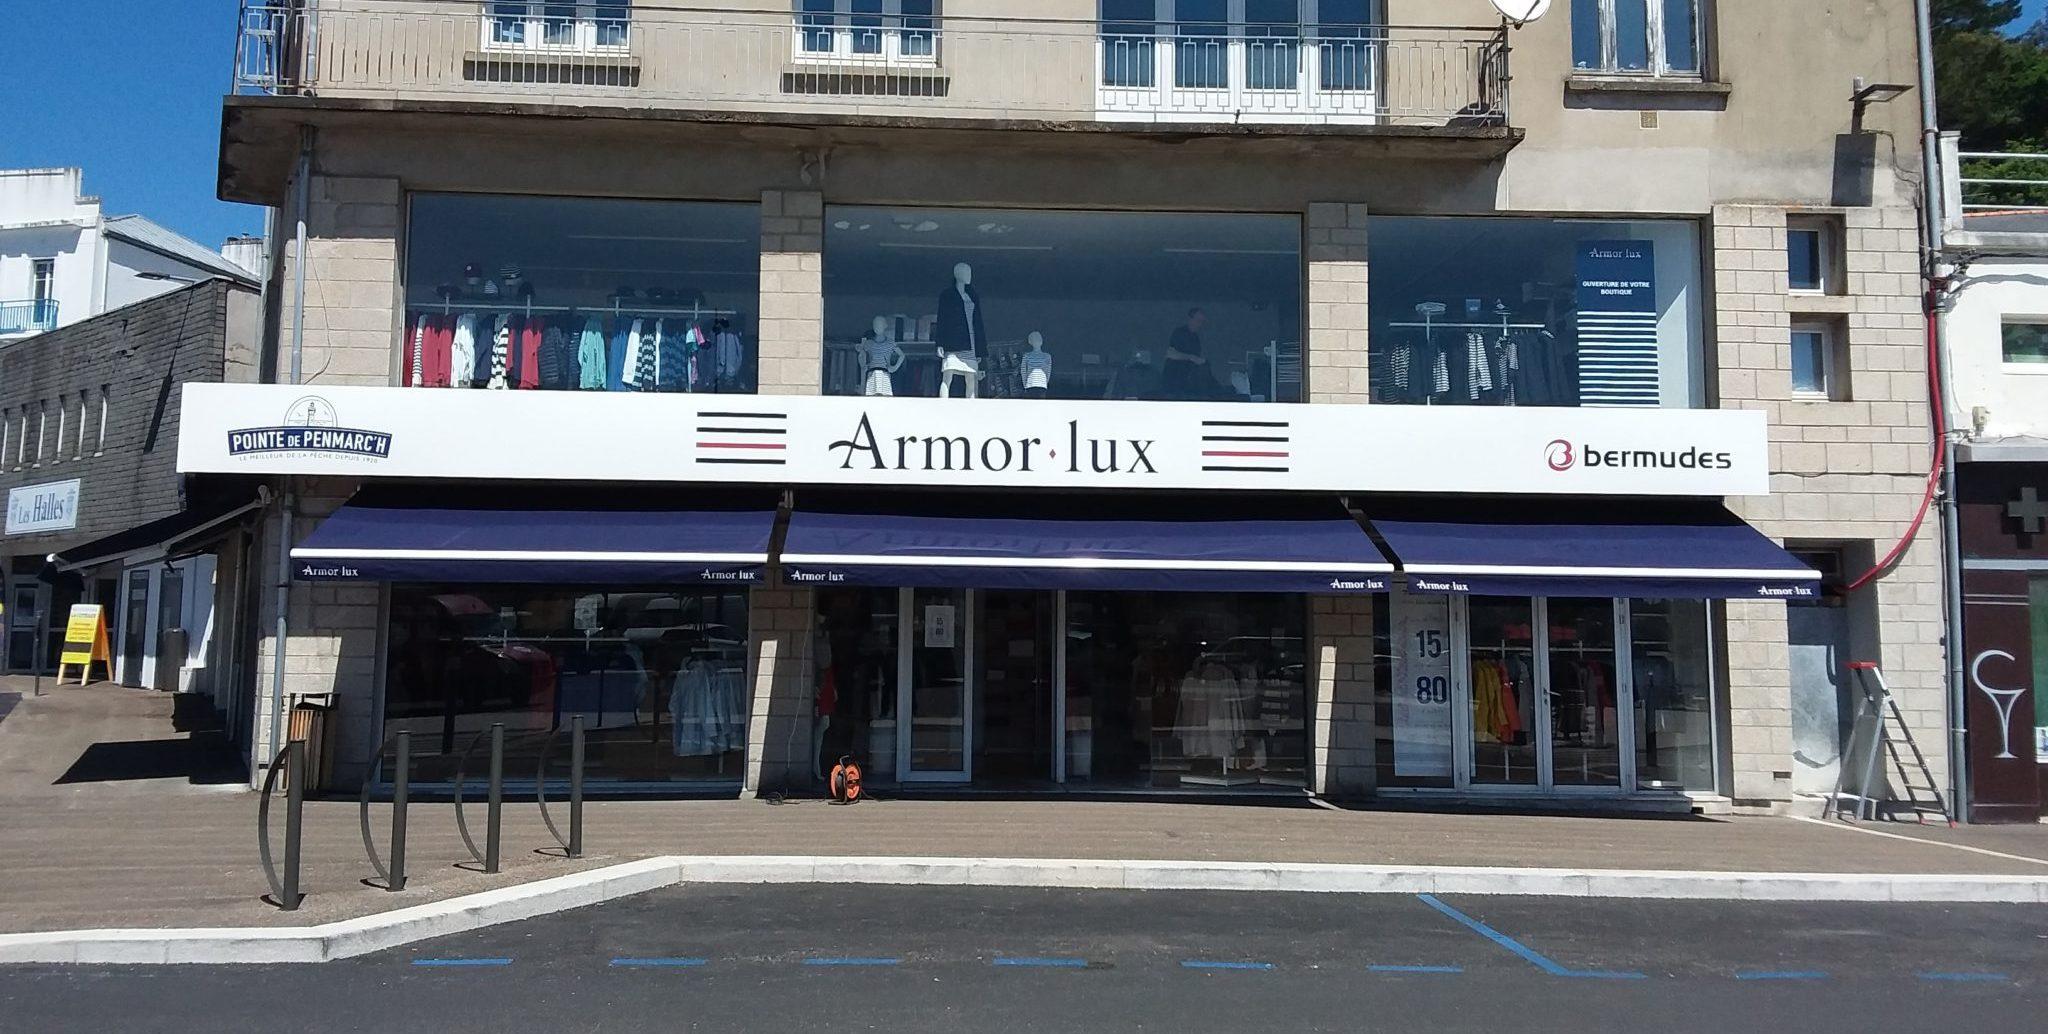 Armor lux - Audierne